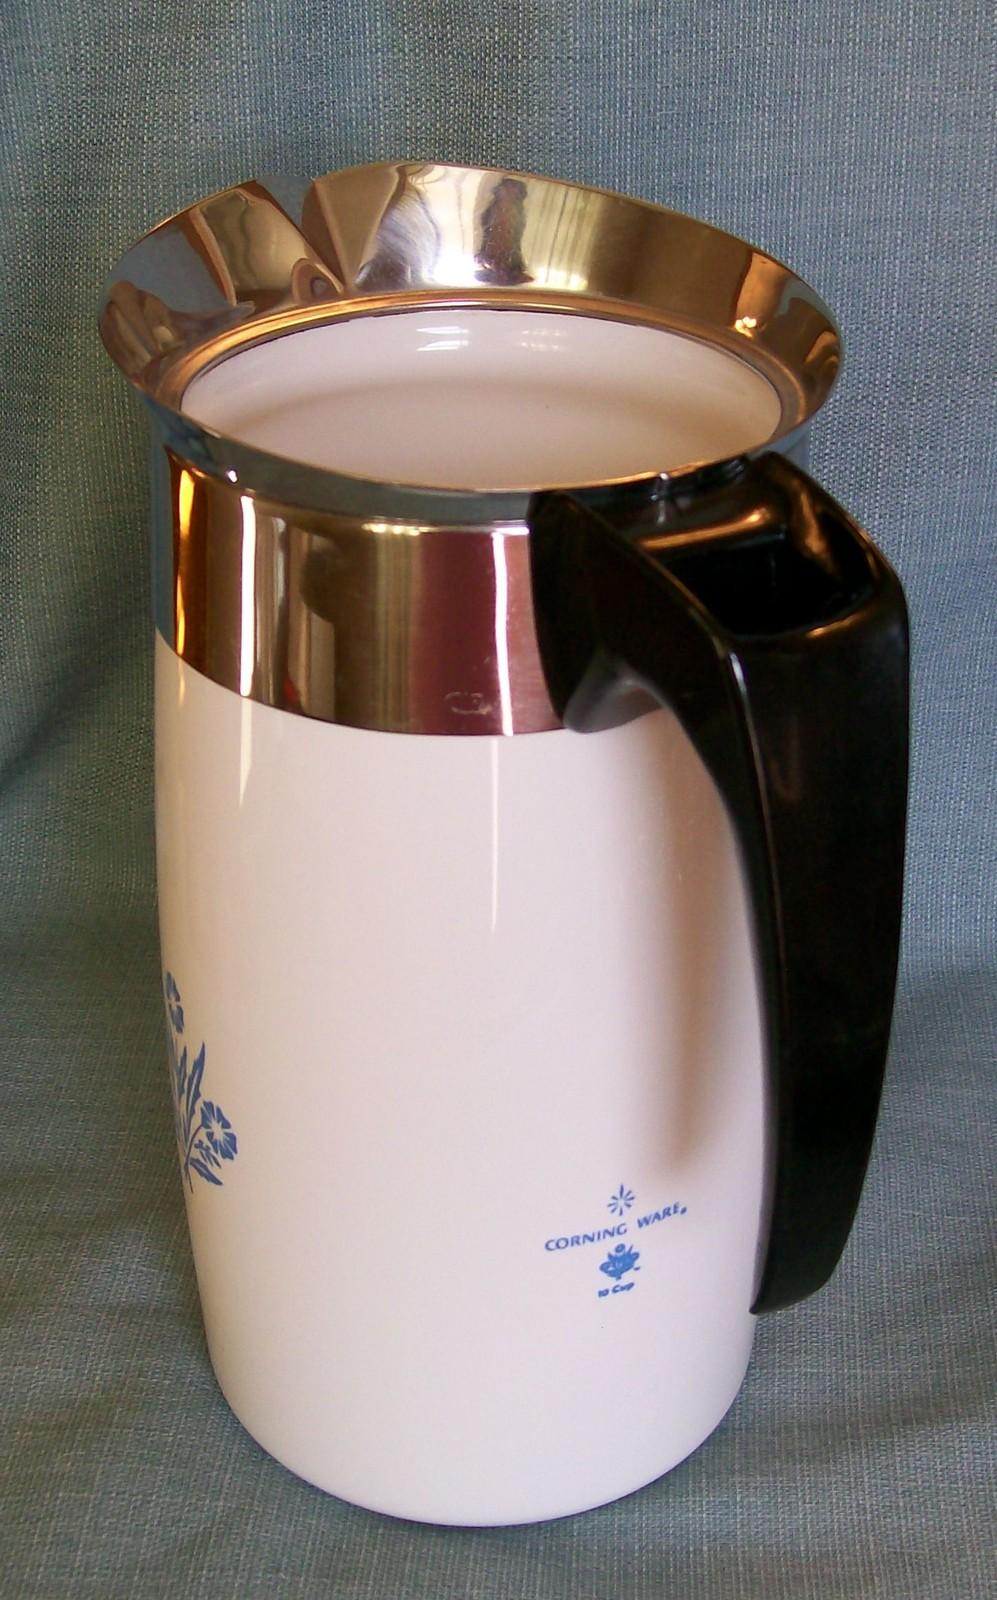 Corning Ware BLUE CORNFLOWER Electric Coffee Pot/Percolator 10 cup P-80-EP EUVC image 4